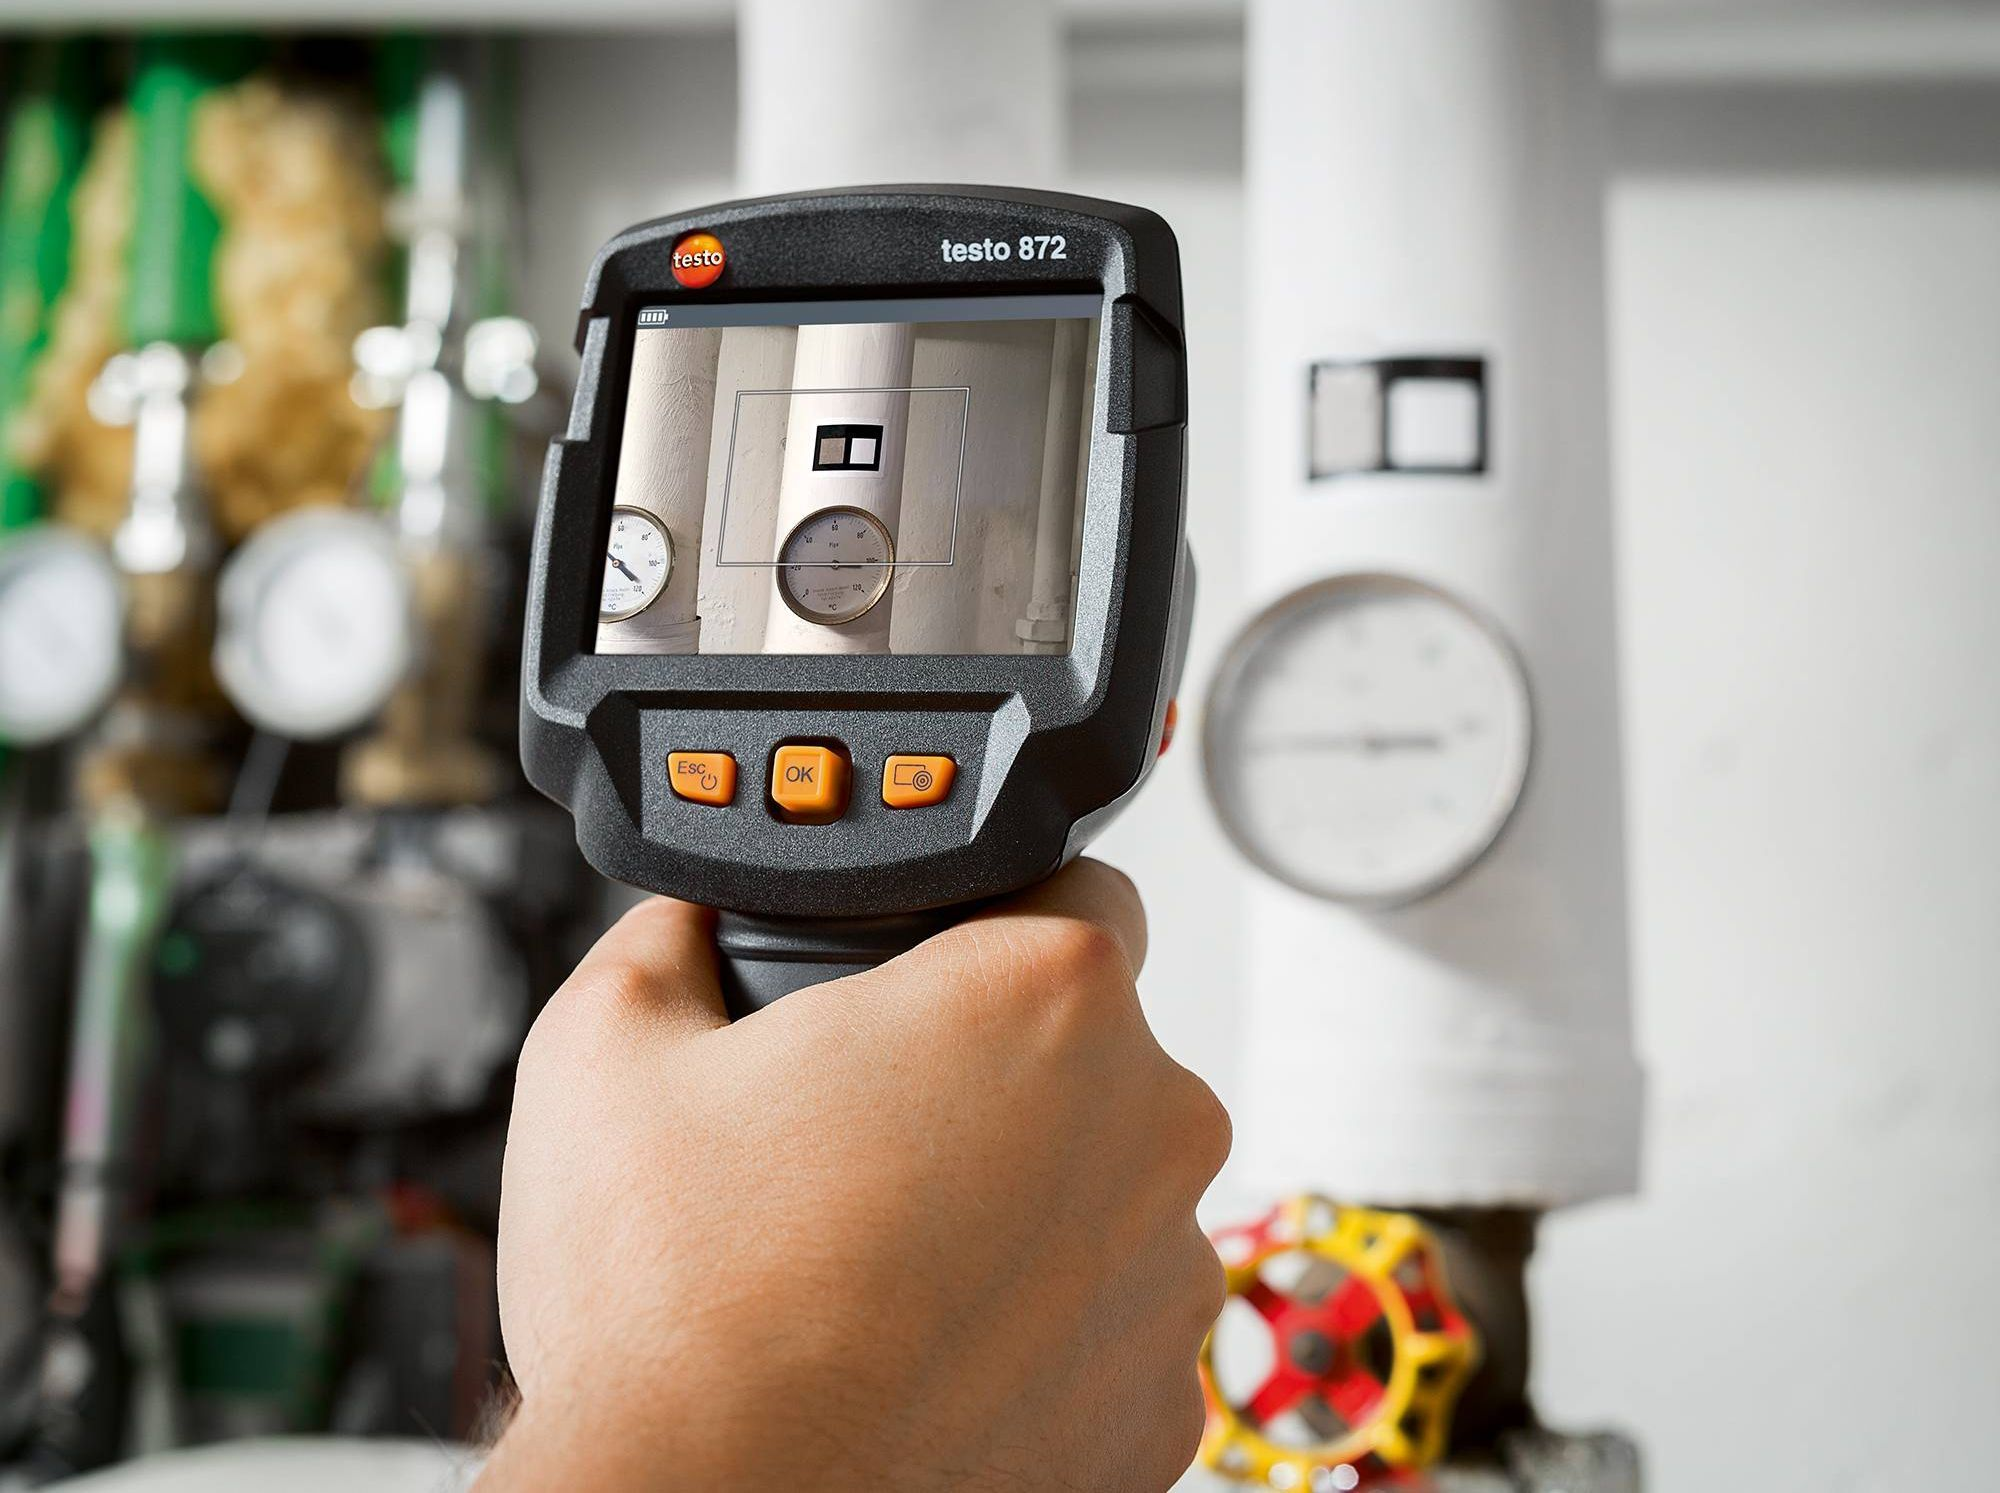 testo 871 Thermal Imaging Camera with App Part No. 0560